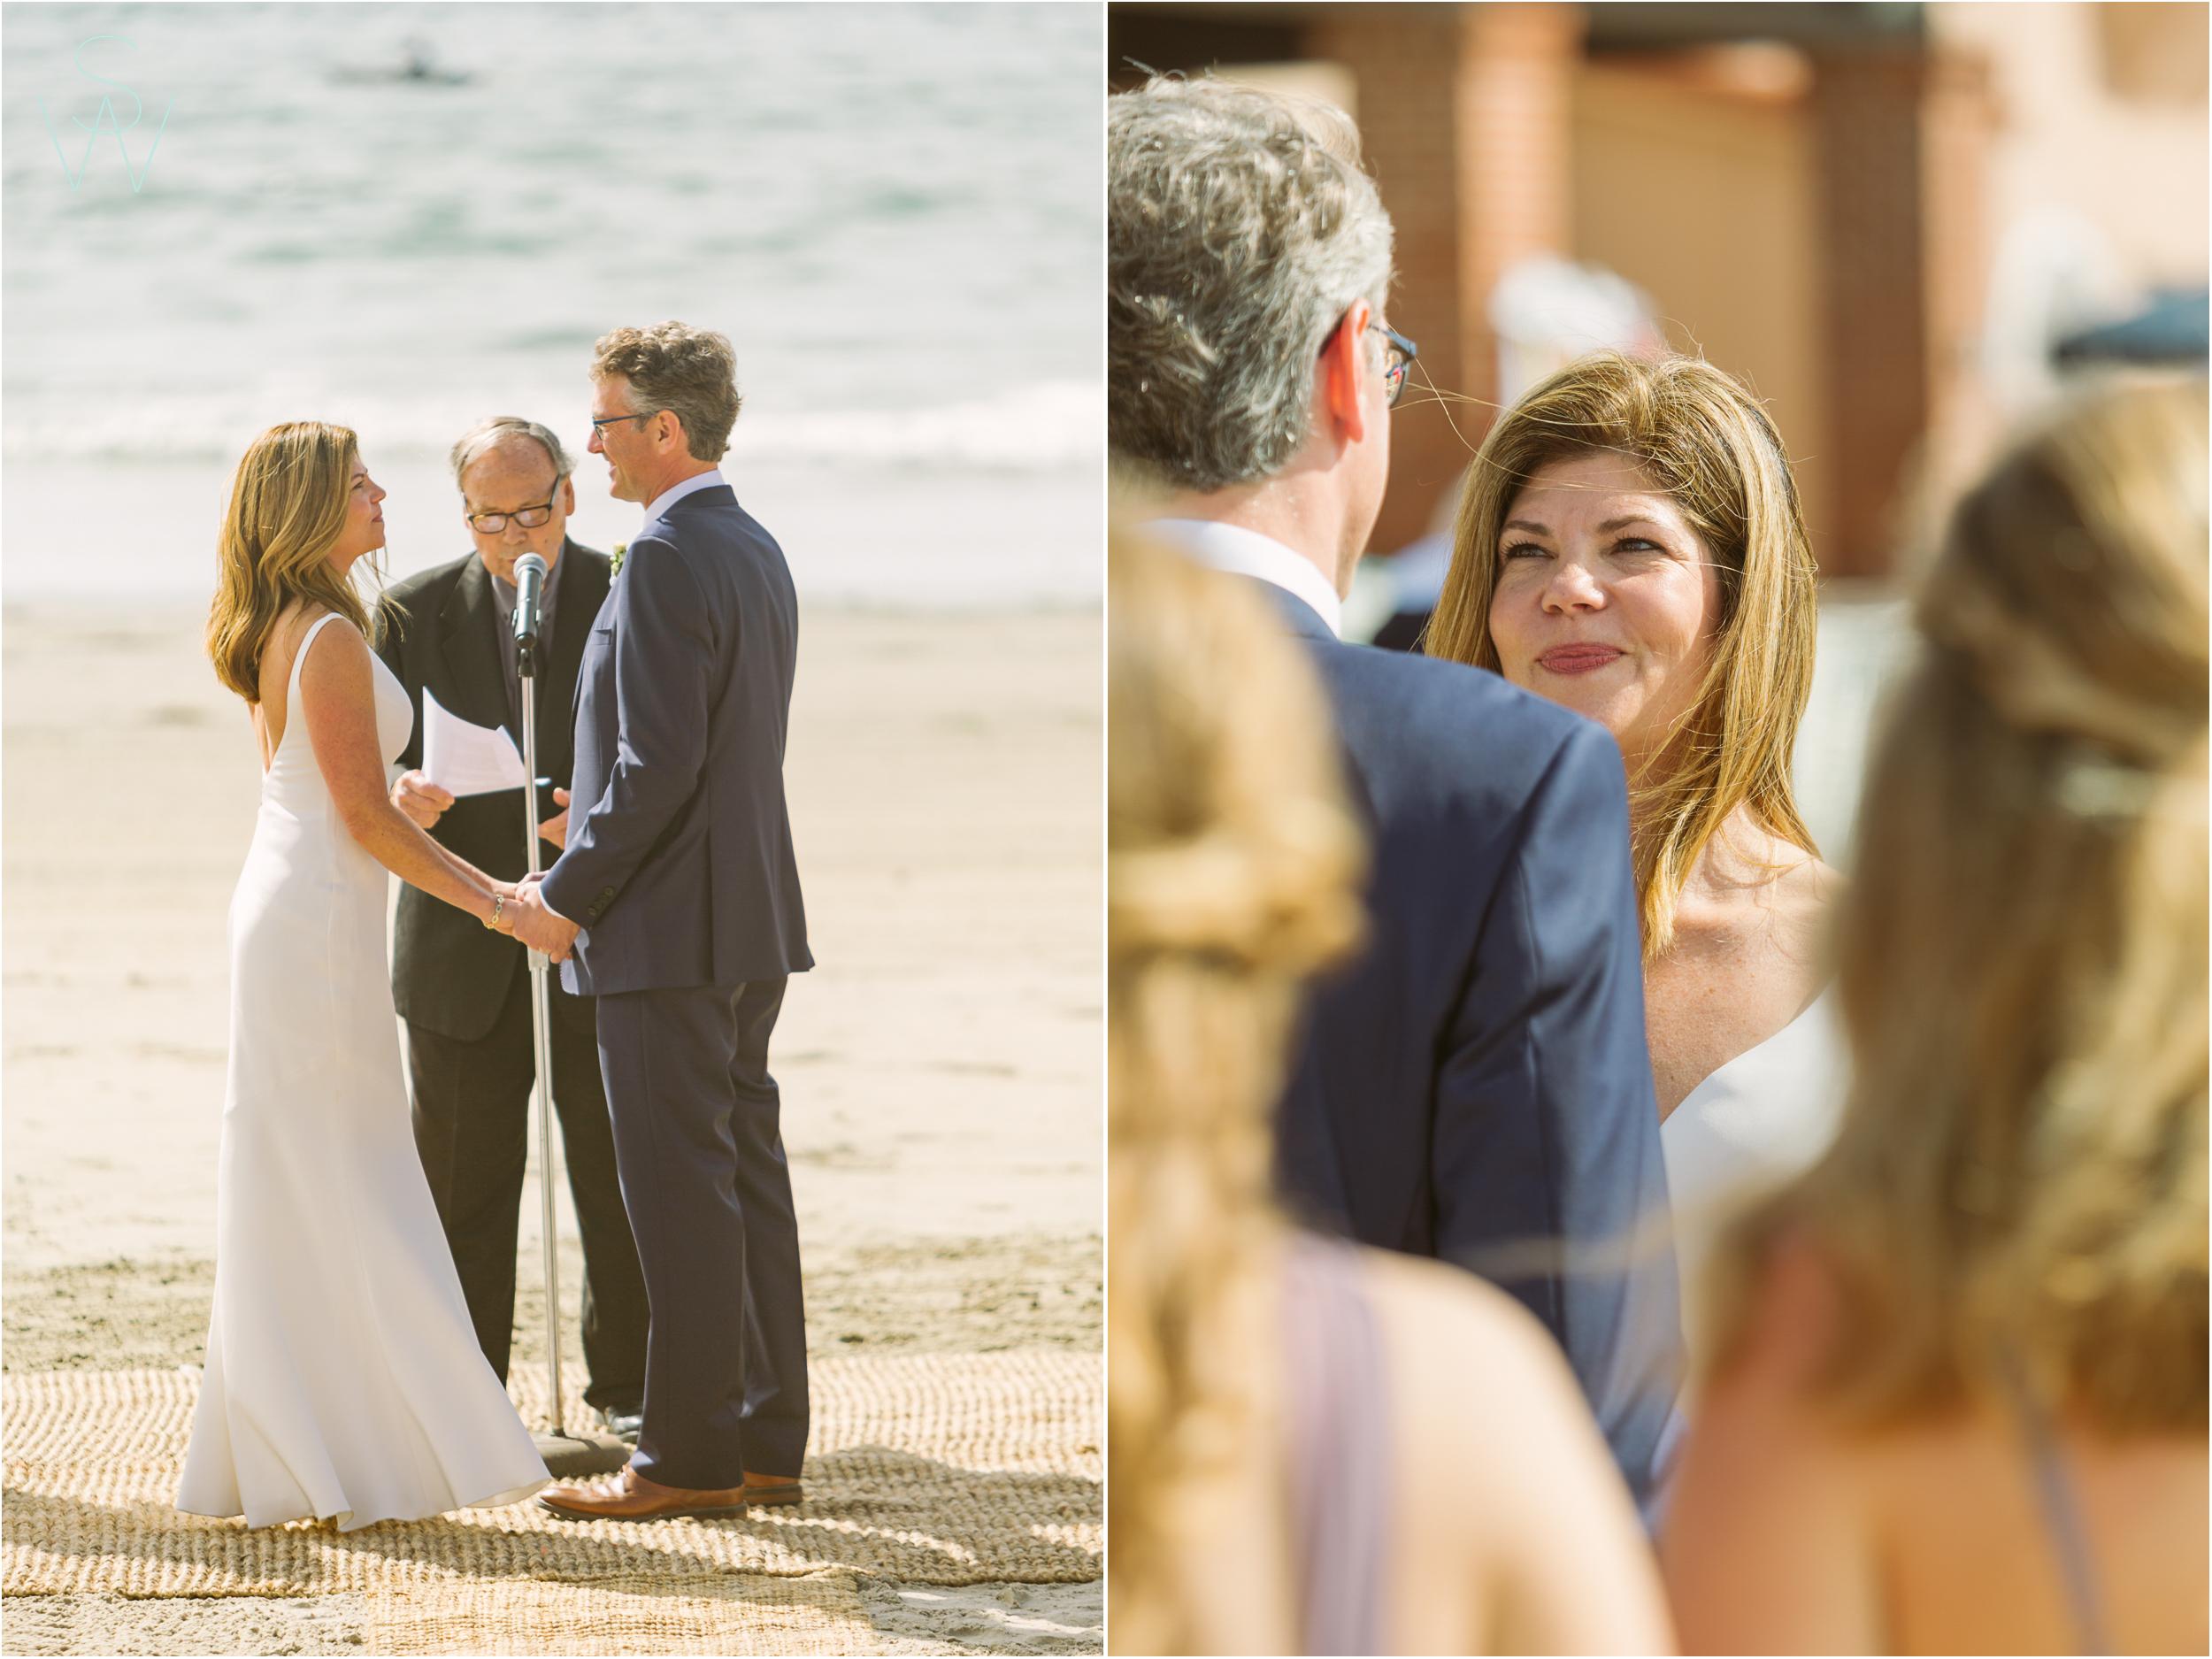 shewanders.wedding.photography.la.jolla-1031.jpg